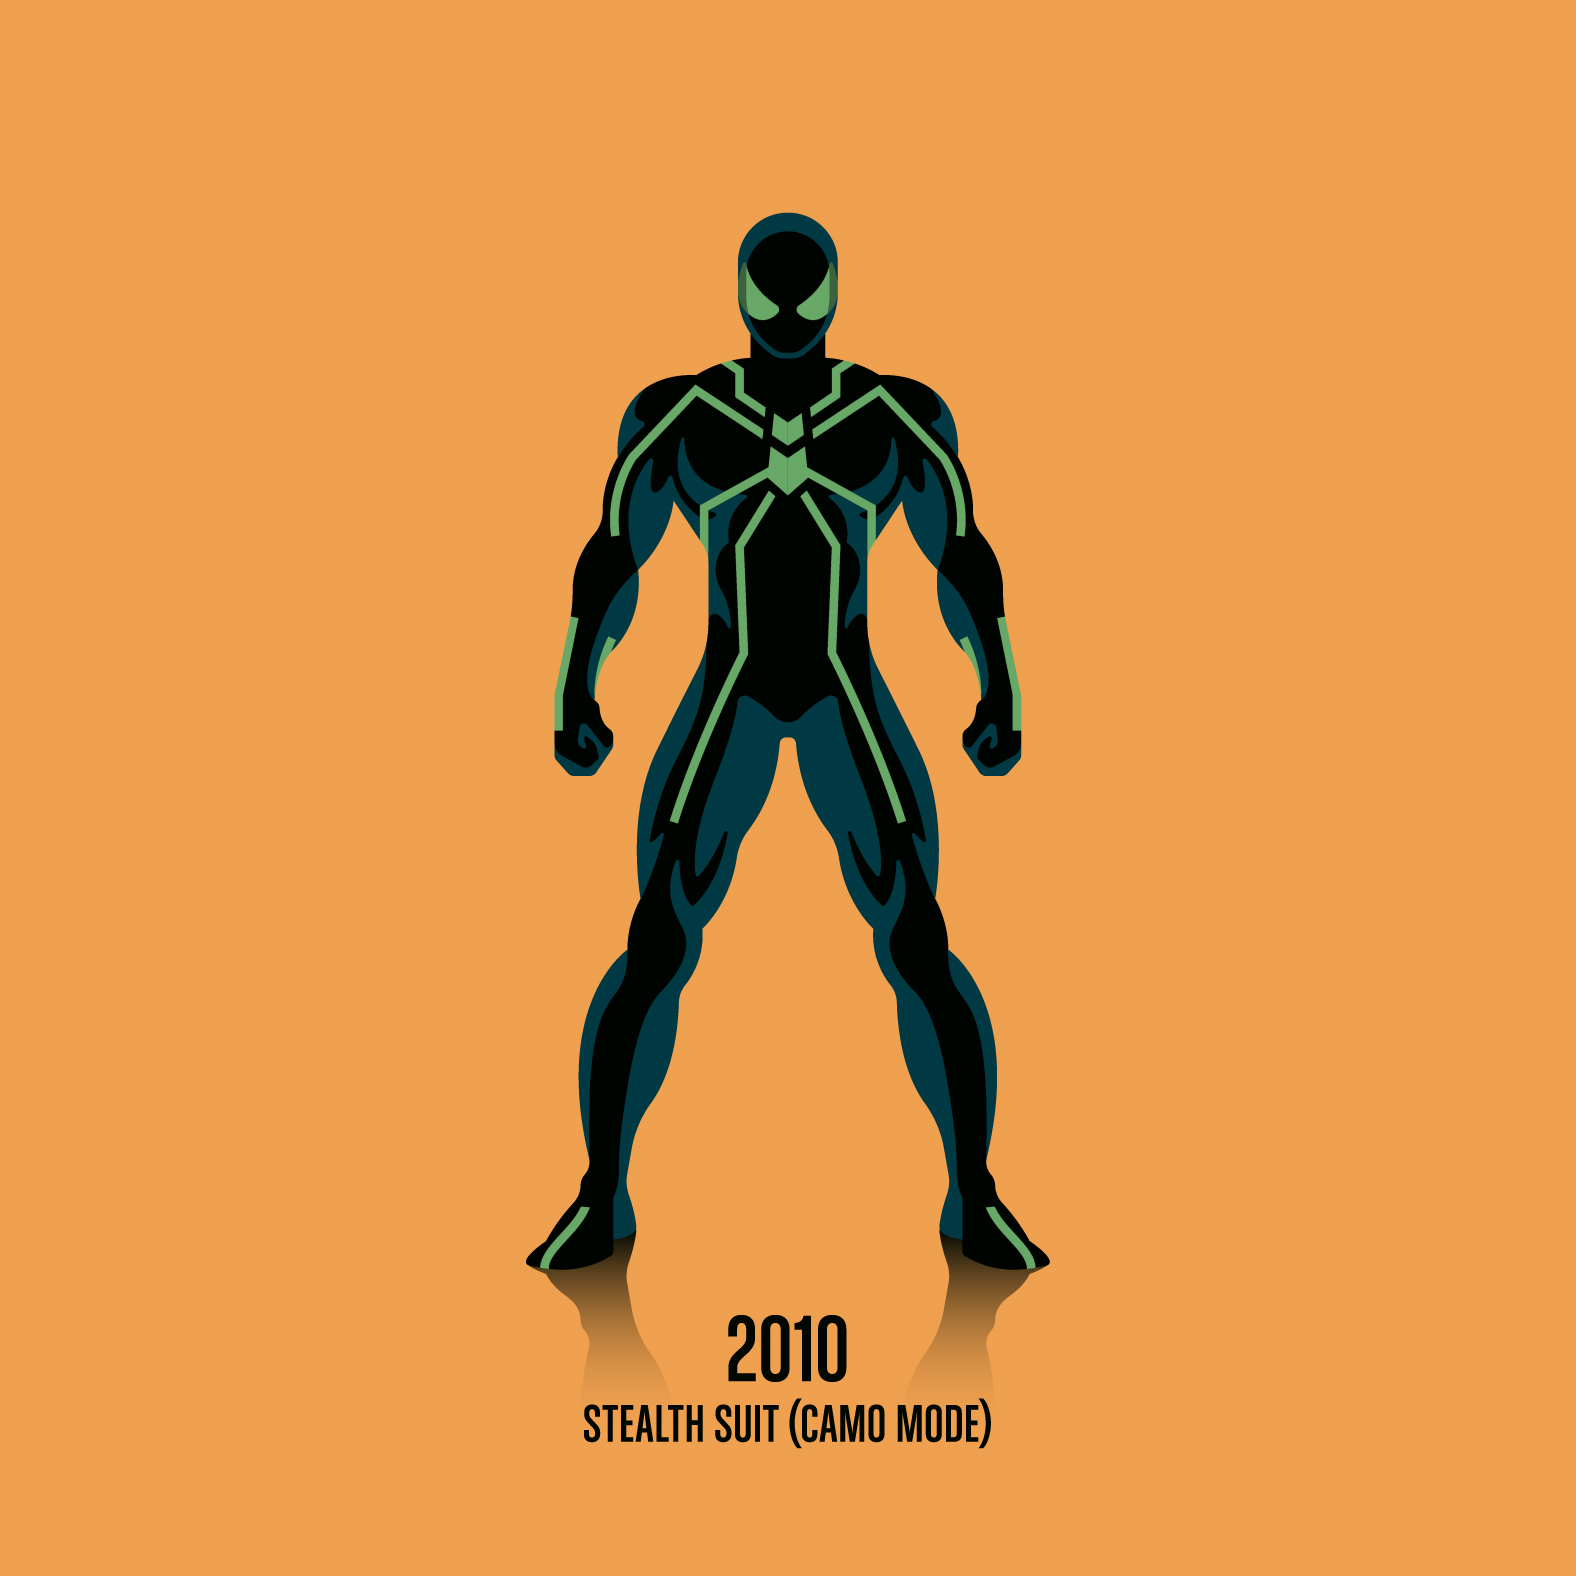 2_spiderman-04.jpg